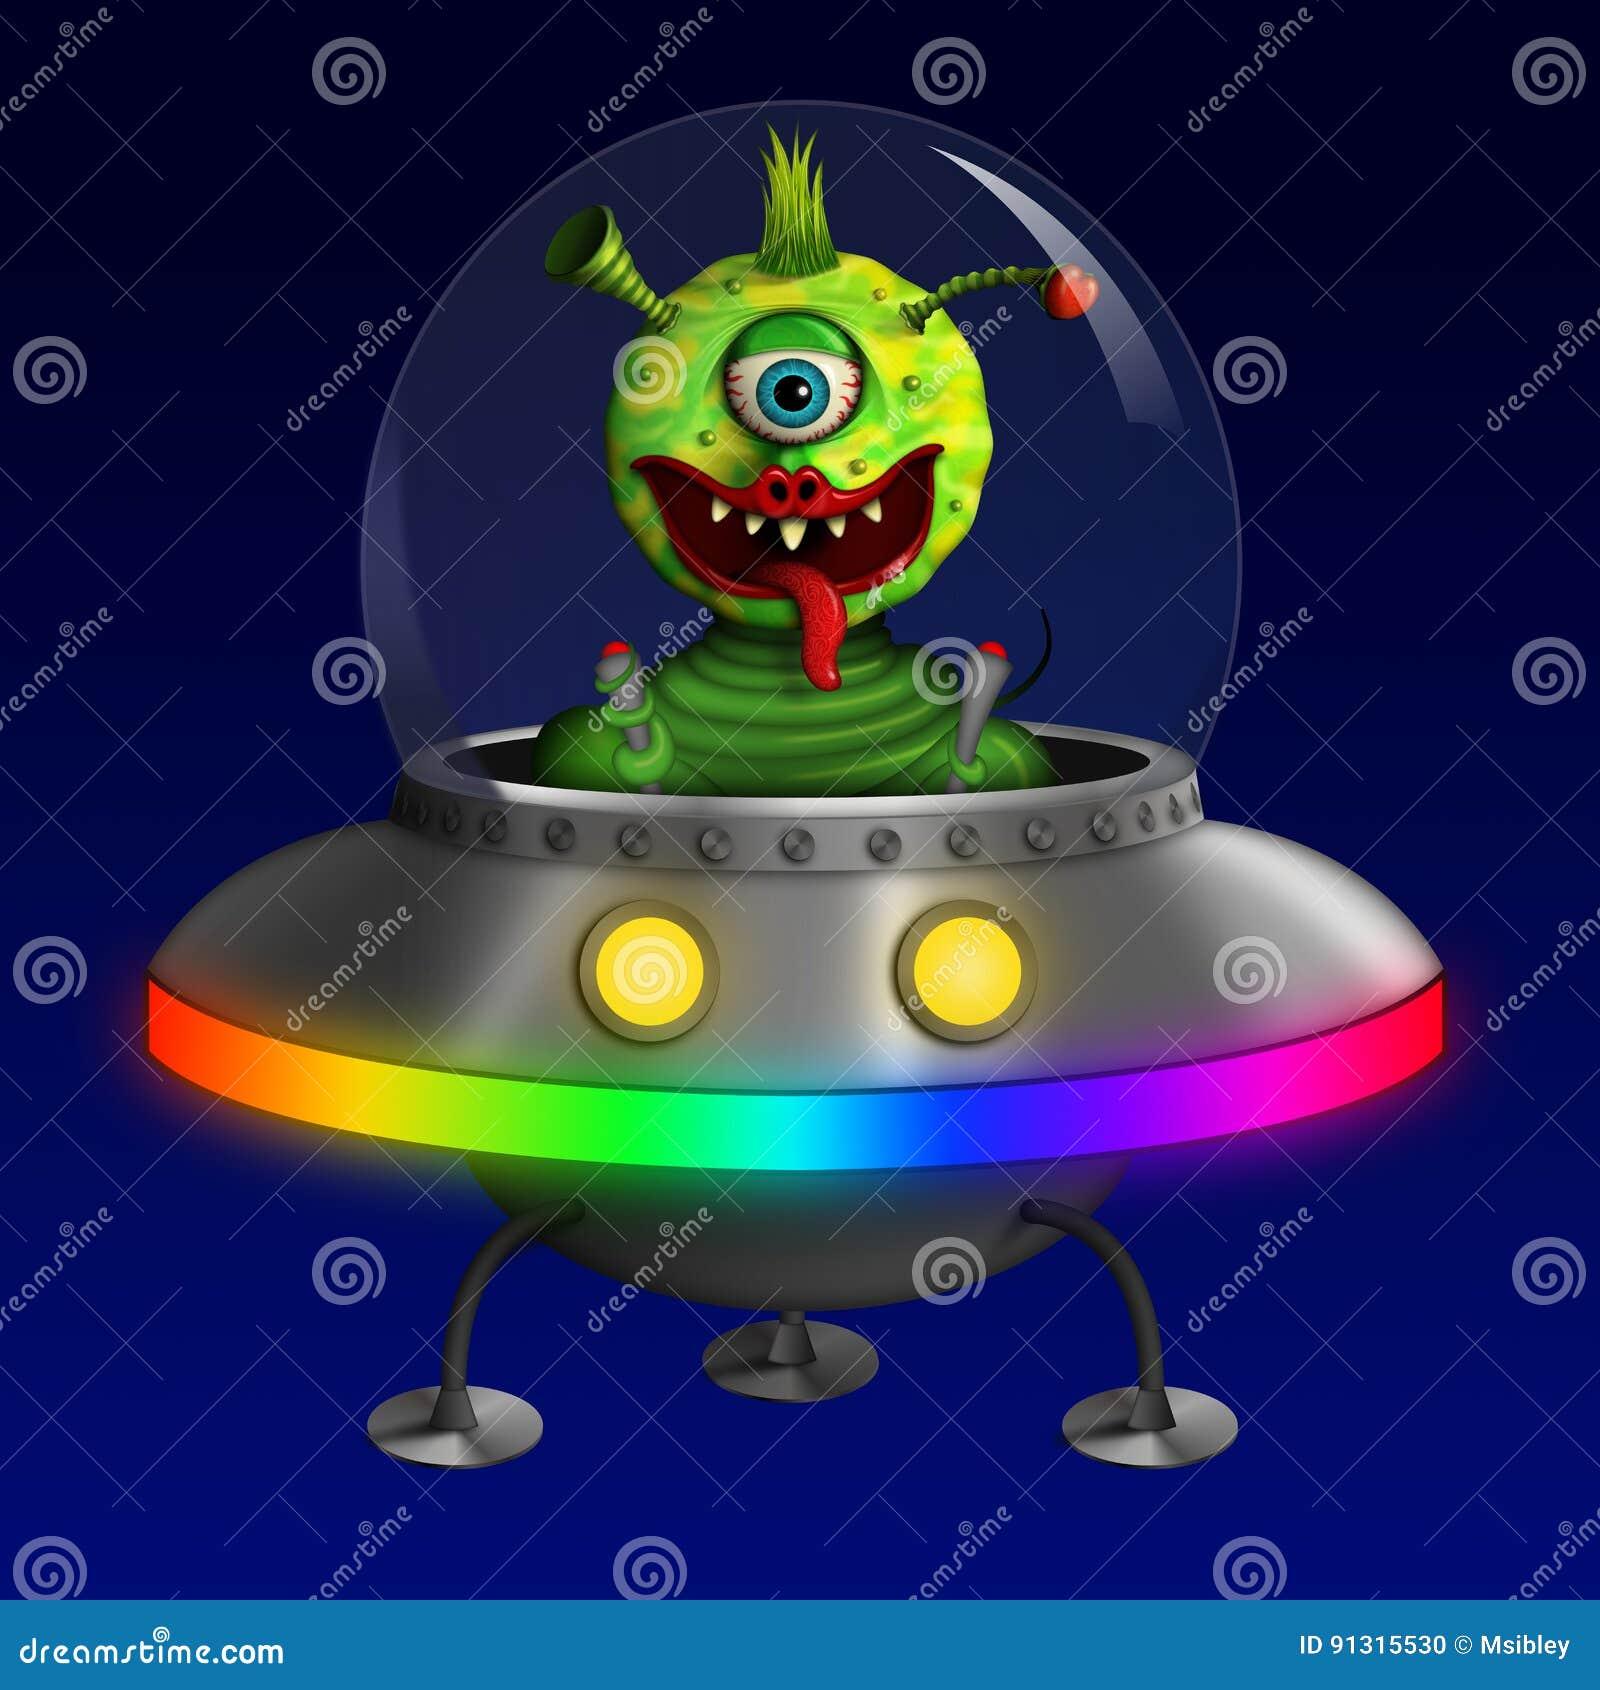 Alien in Flying Saucer UFO